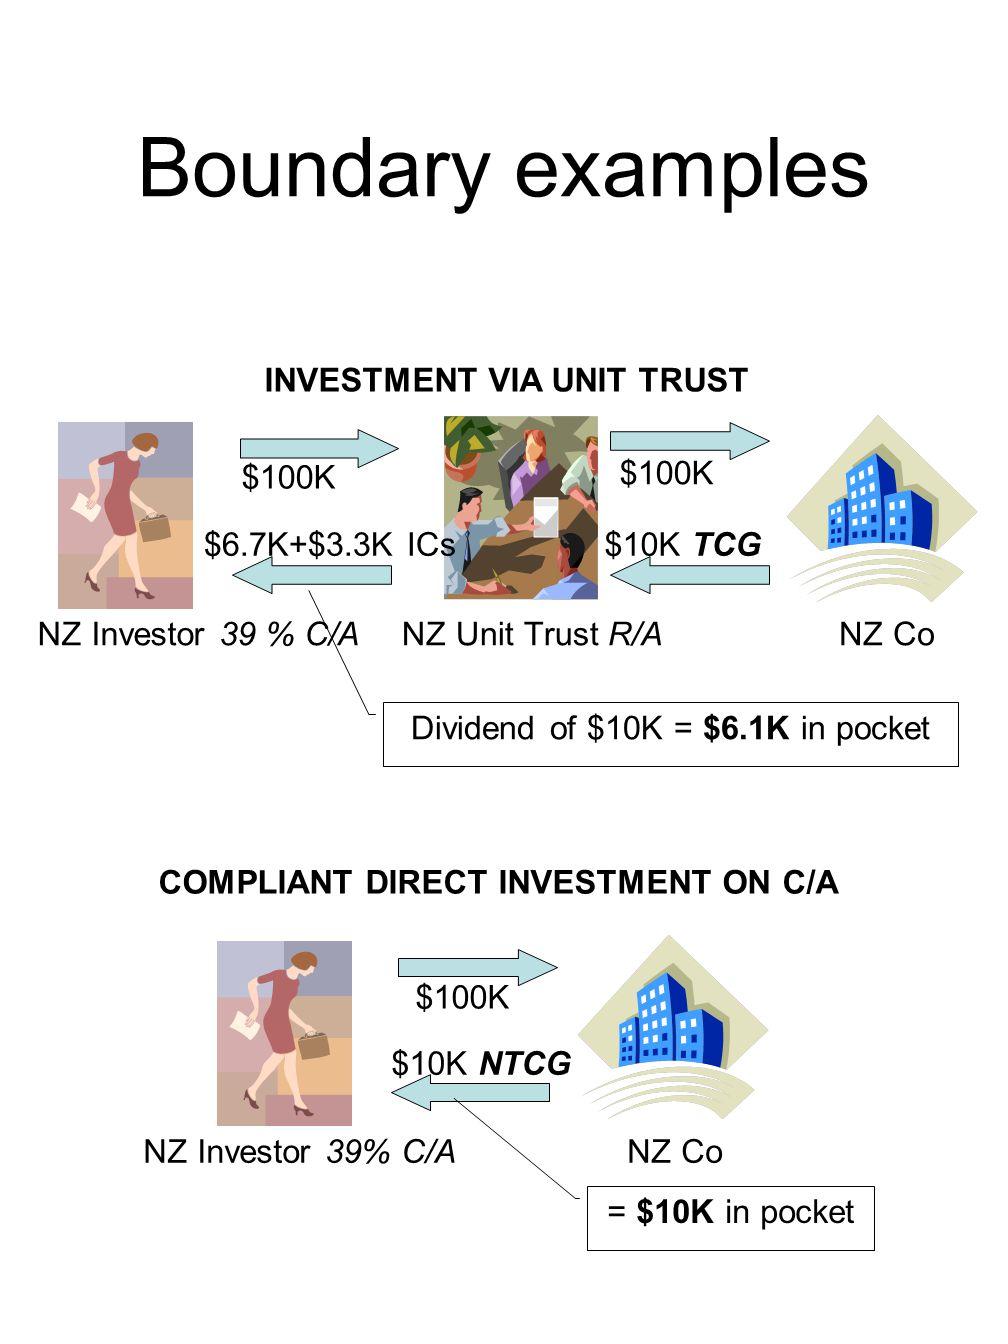 Boundary examples NZ Investor 39 % C/A $100K $10K TCG$6.7K+$3.3K ICs NZ Unit Trust R/ANZ Co INVESTMENT VIA UNIT TRUST Dividend of $10K = $6.1K in pocket $100K NZ Co $10K NTCG NZ Investor 39% C/A COMPLIANT DIRECT INVESTMENT ON C/A = $10K in pocket